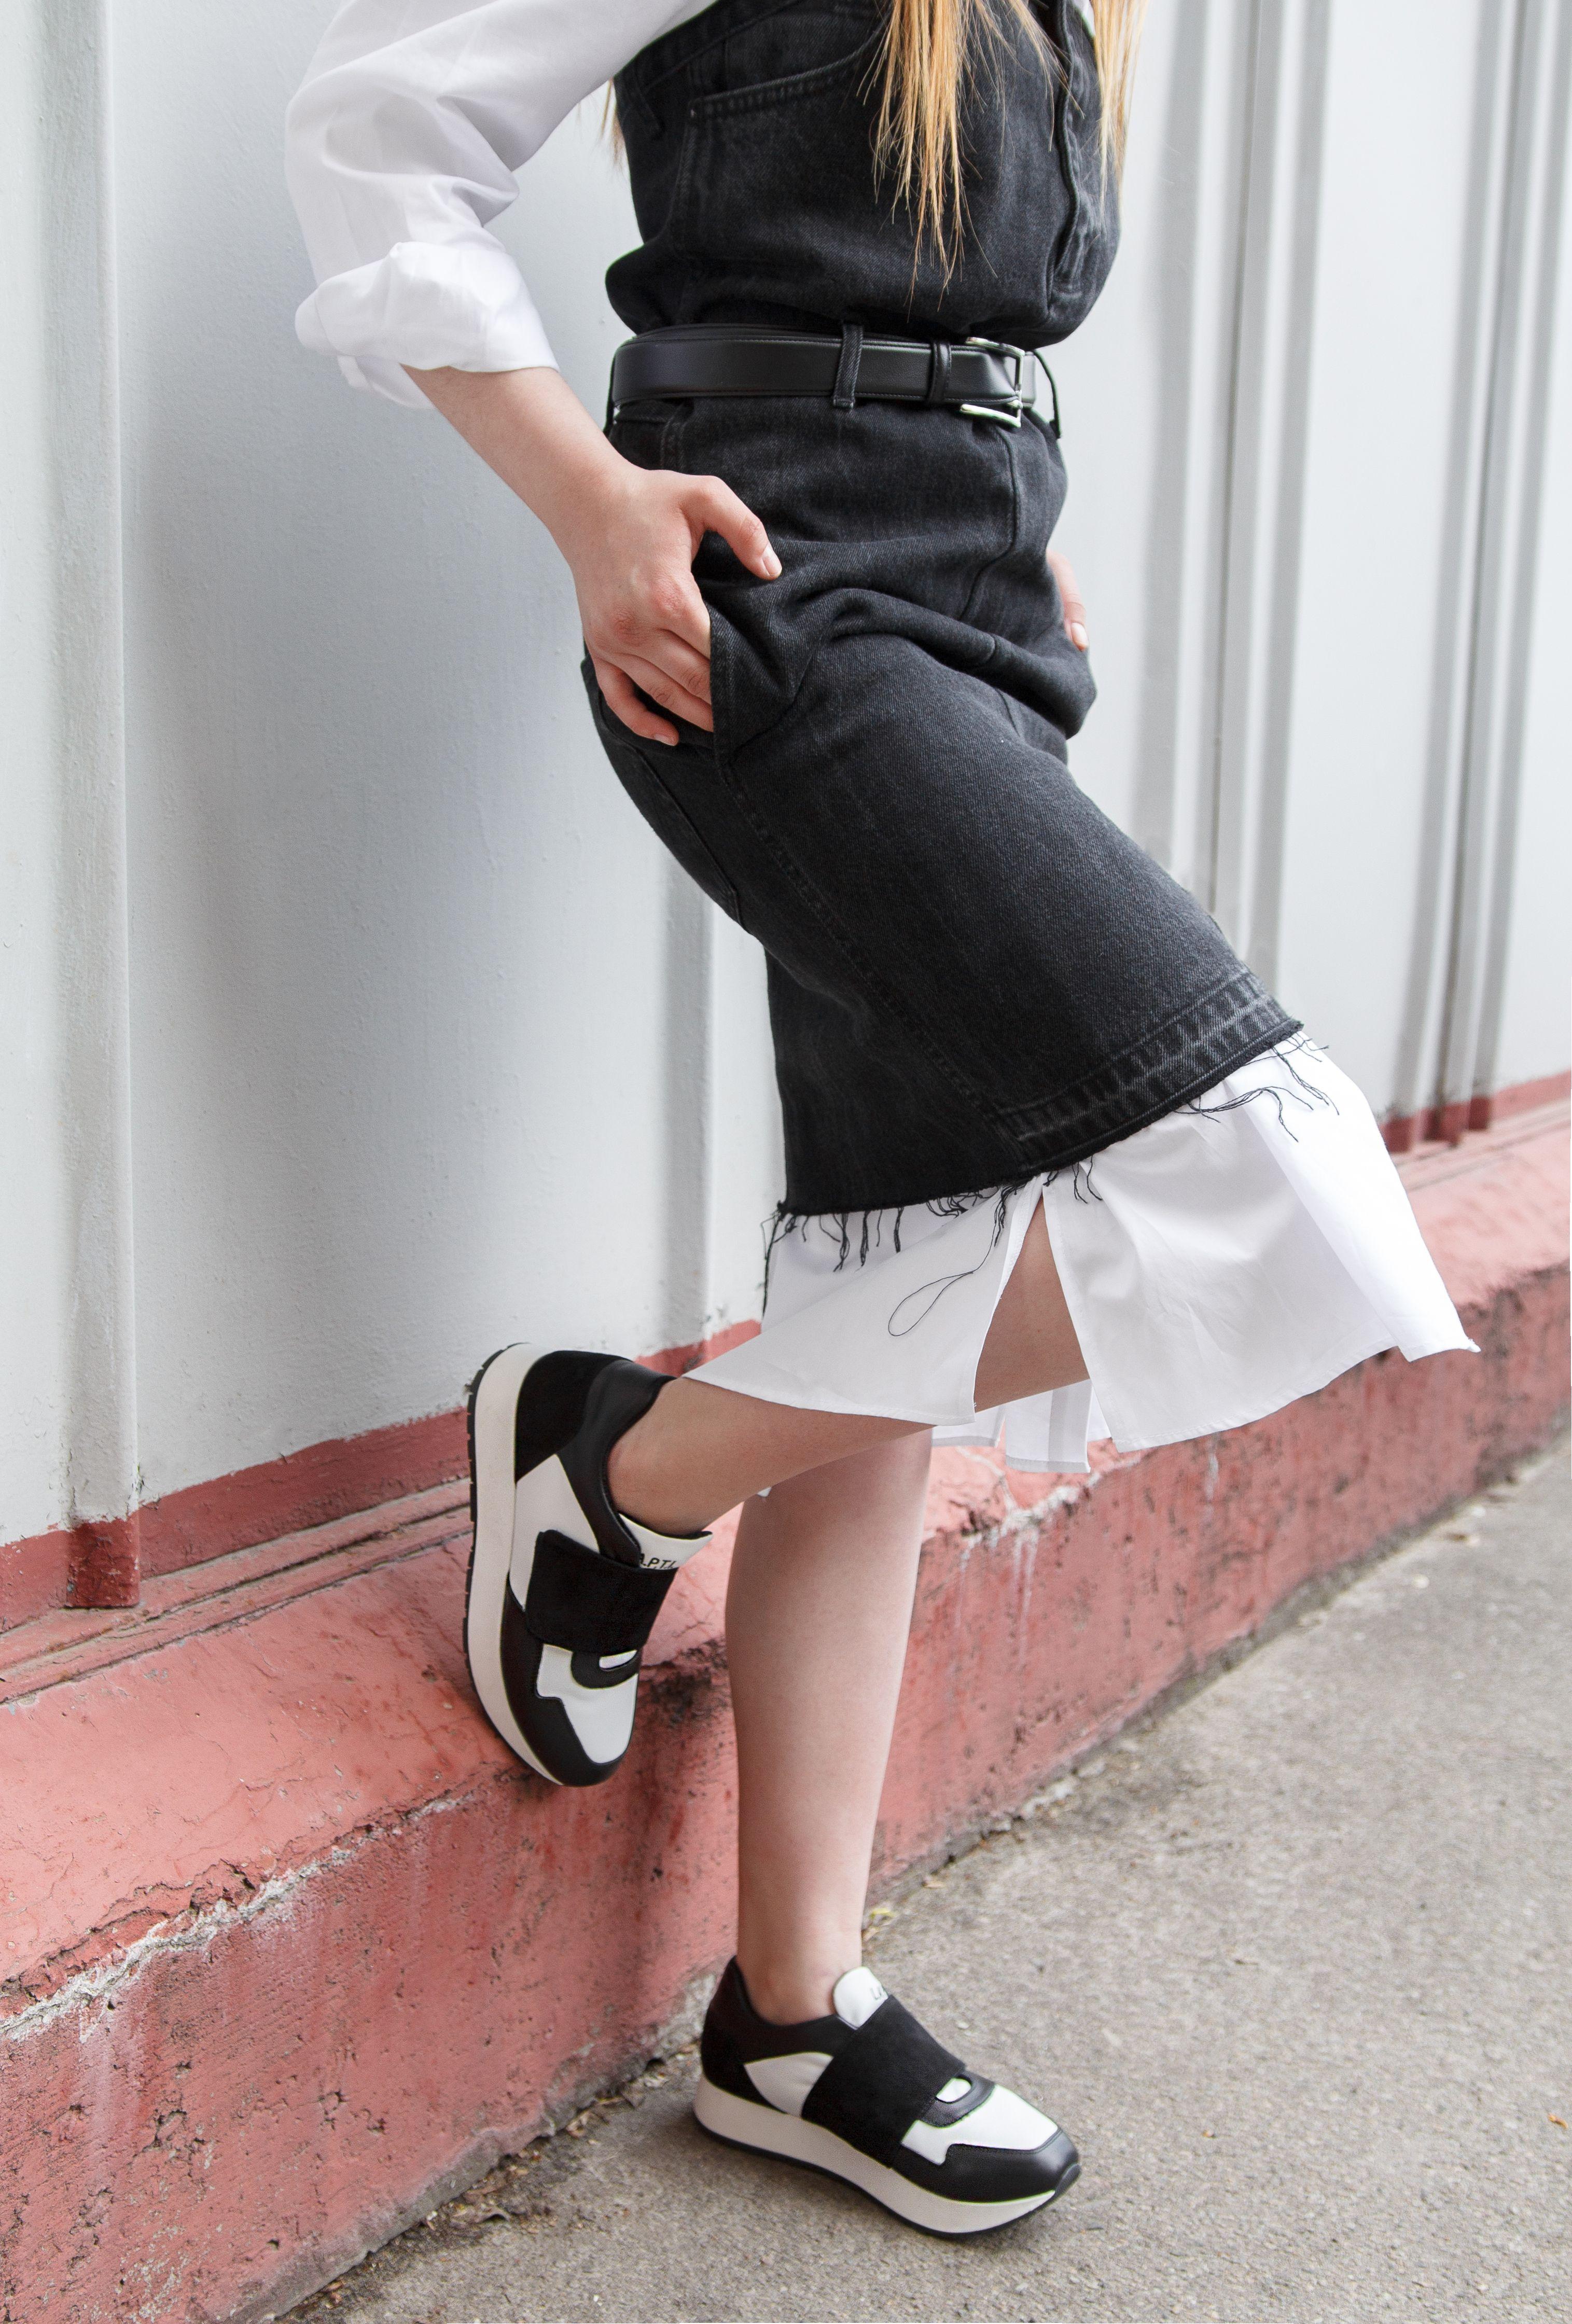 efdbbcd79 Womens leather sneakers black&white / Женские кожаные черно-белые кроссовки